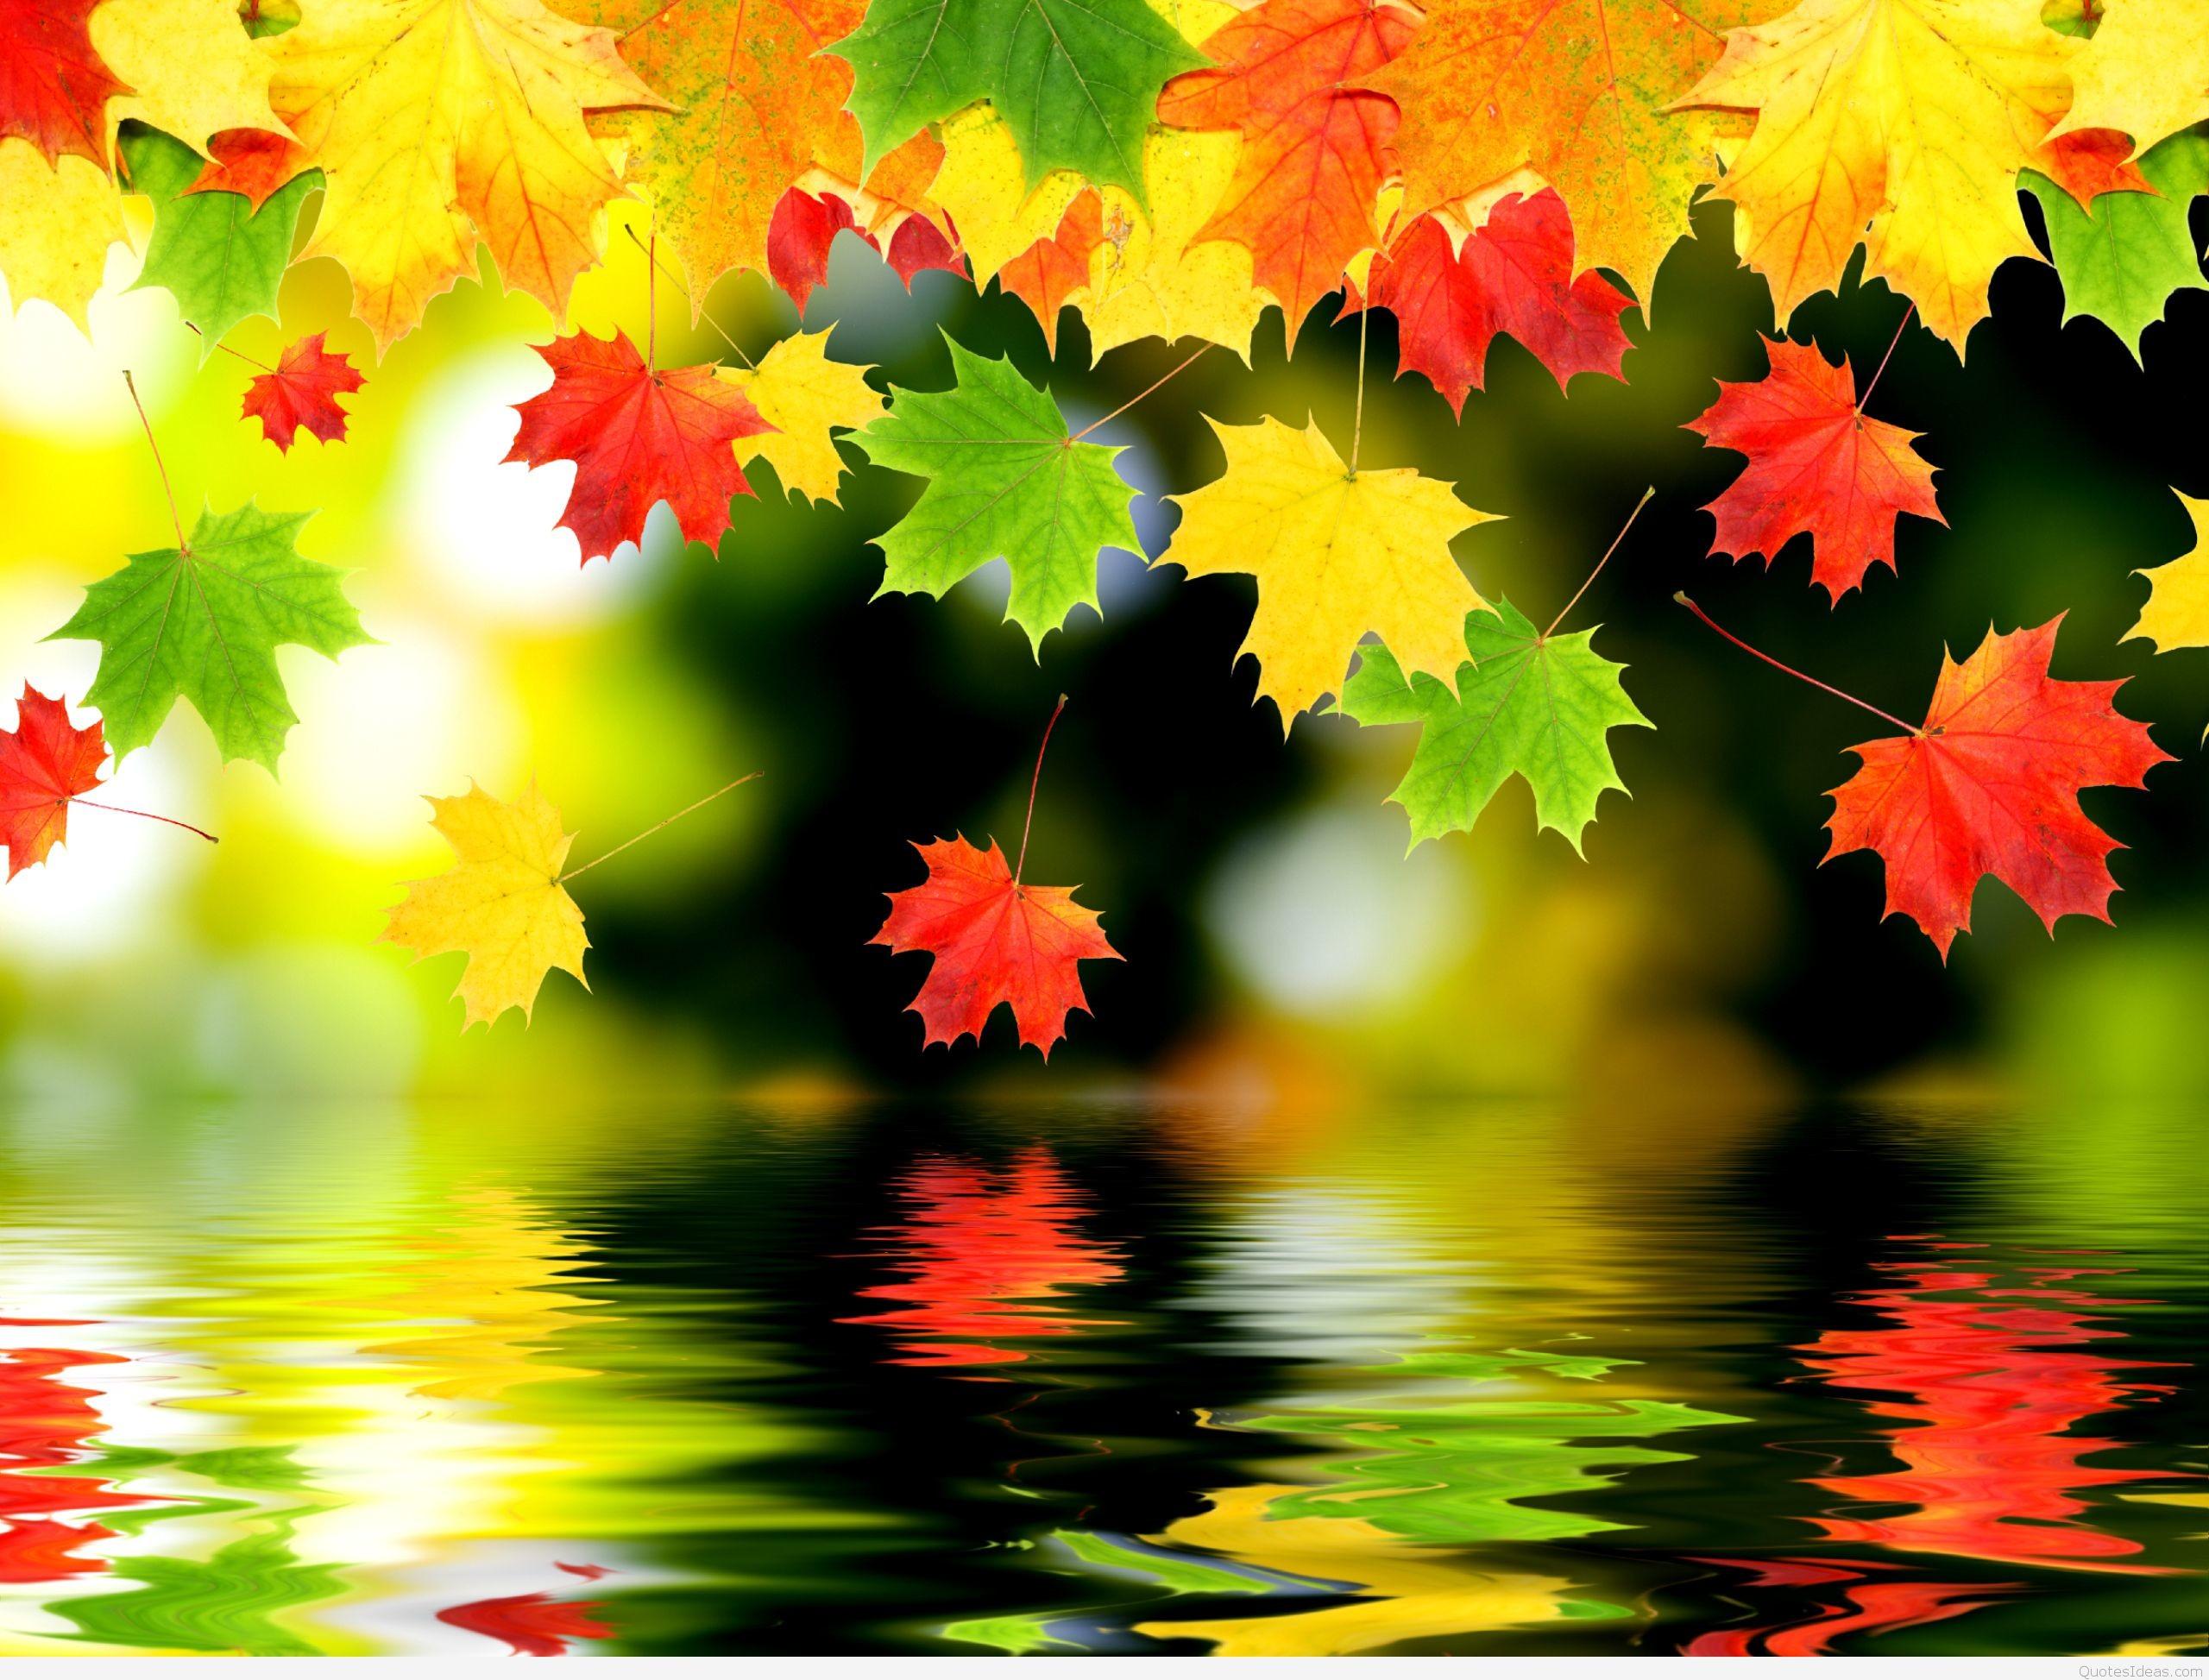 … backgrounds wallpaper tianyihengfeng free download; autumn wallpaper on  wallpaperget com …